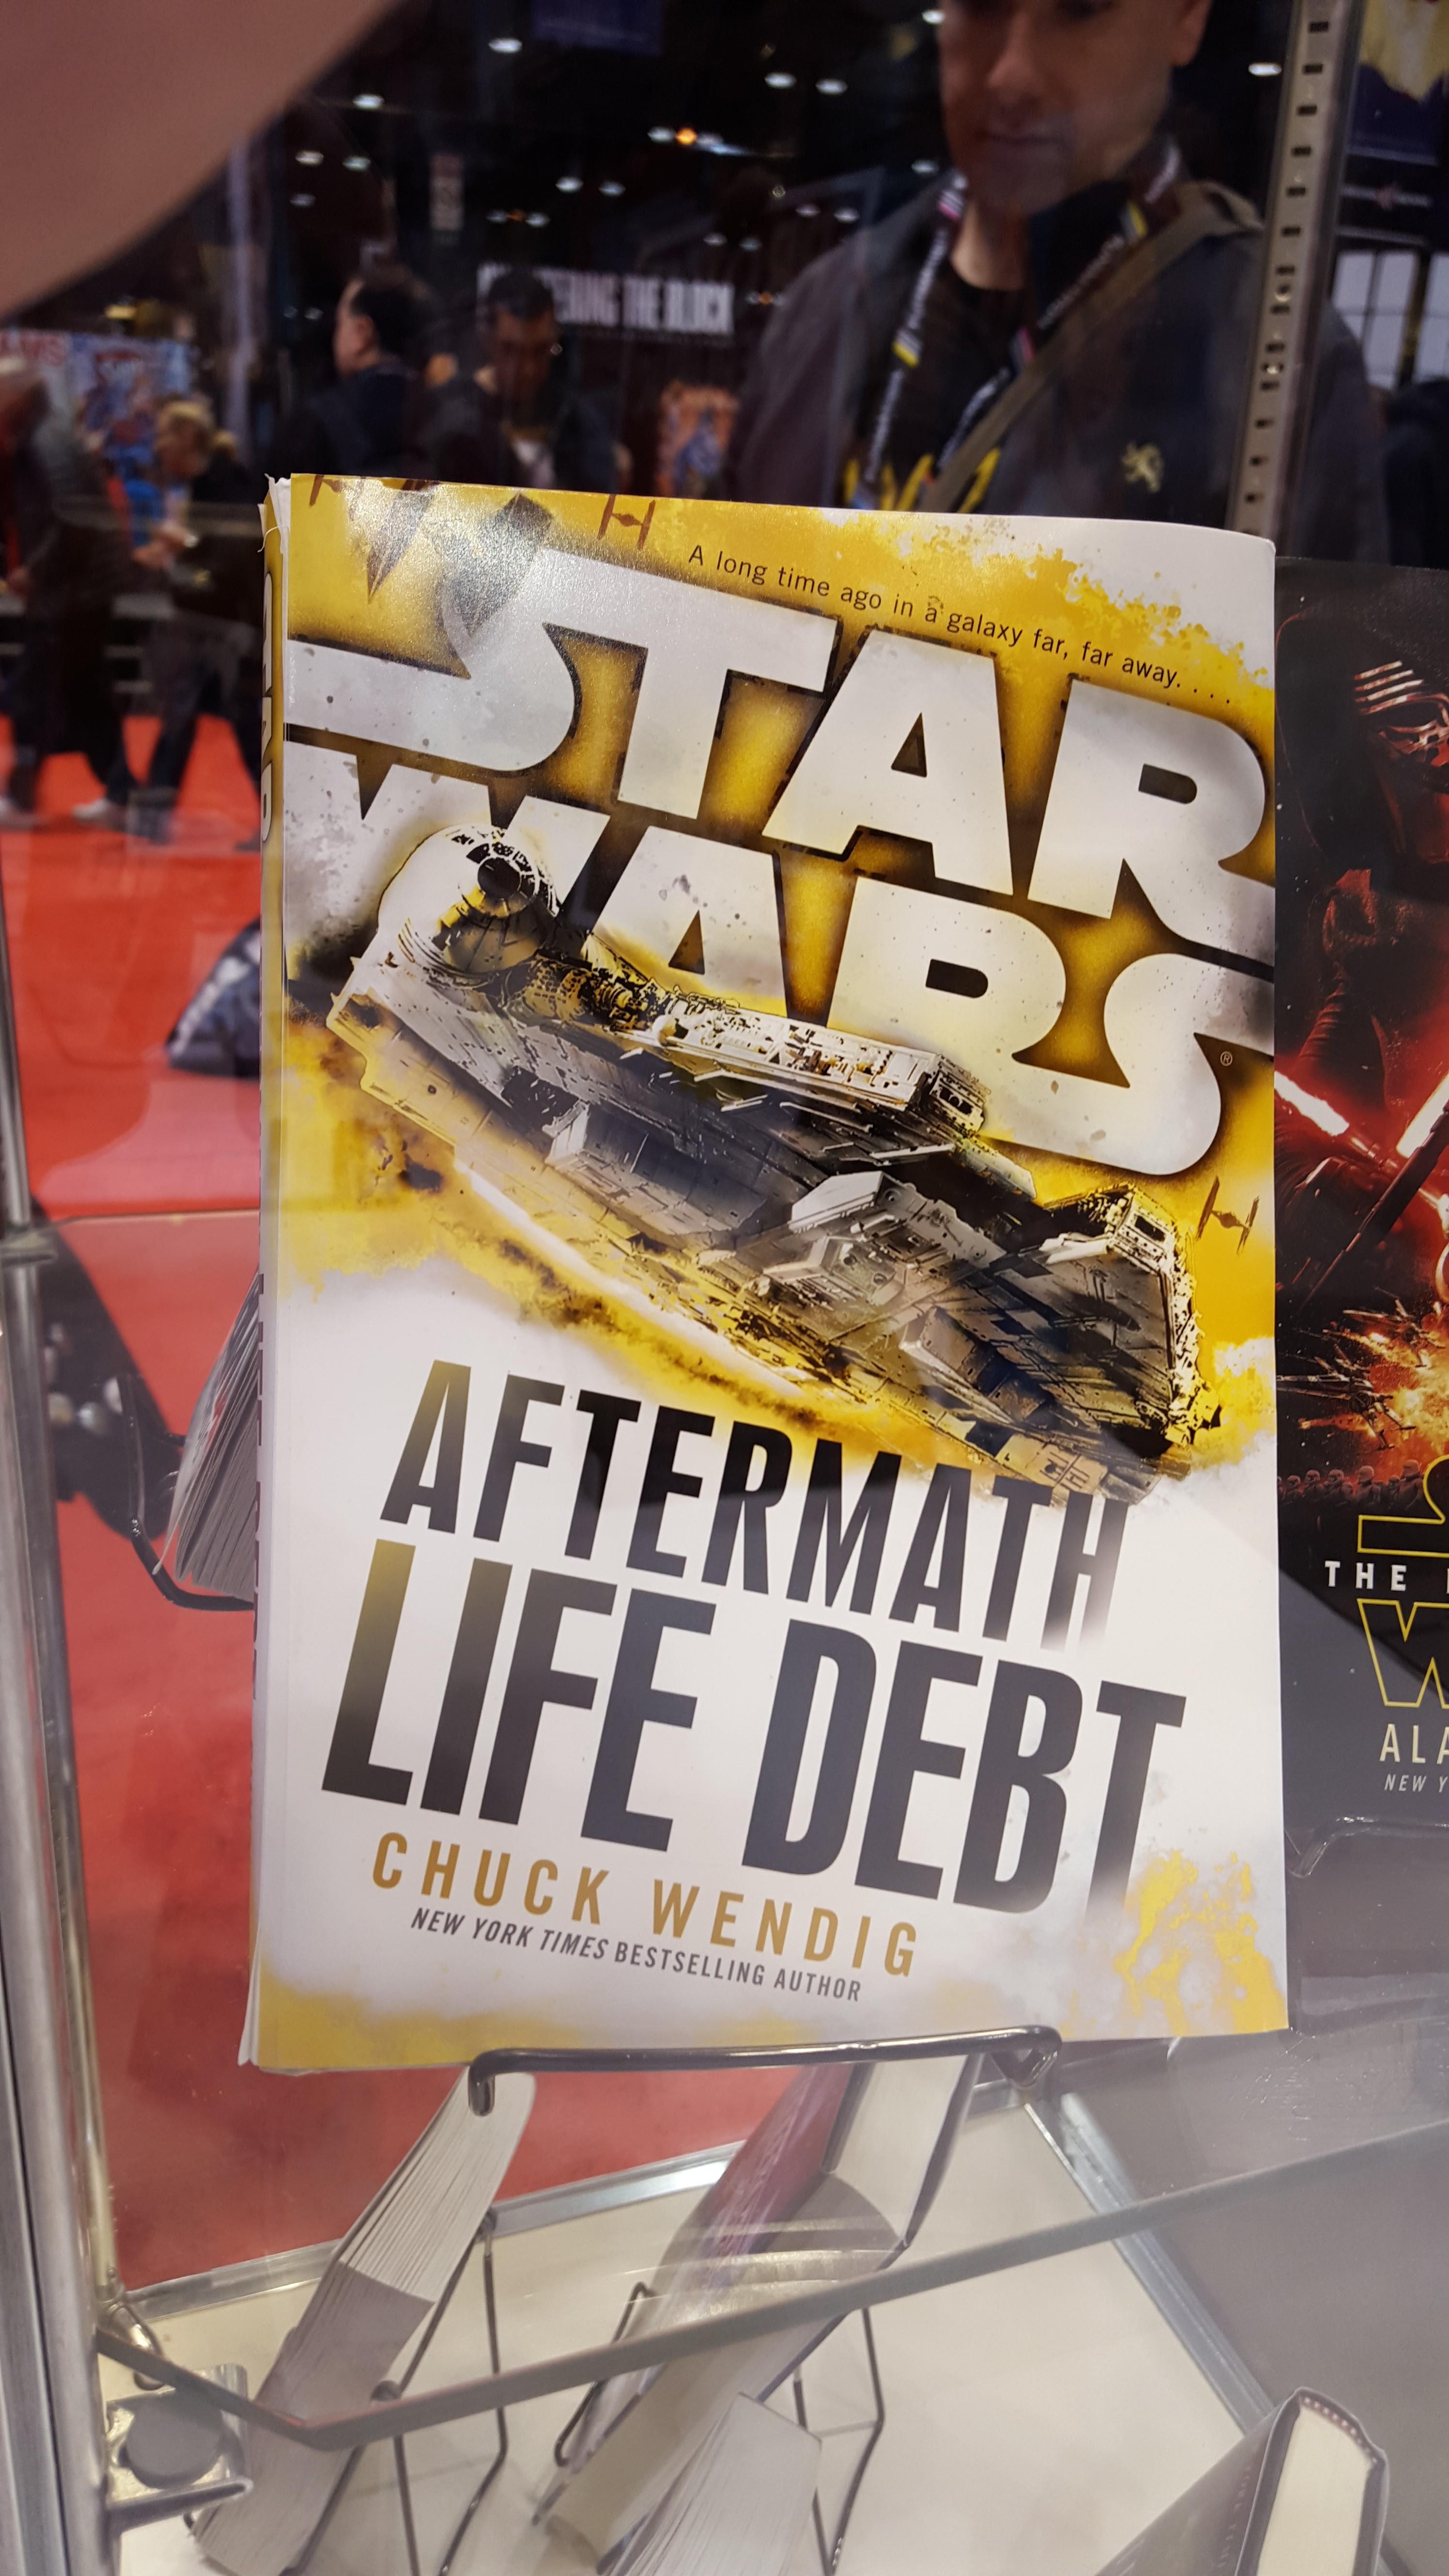 Wendig, Book, Life Debt